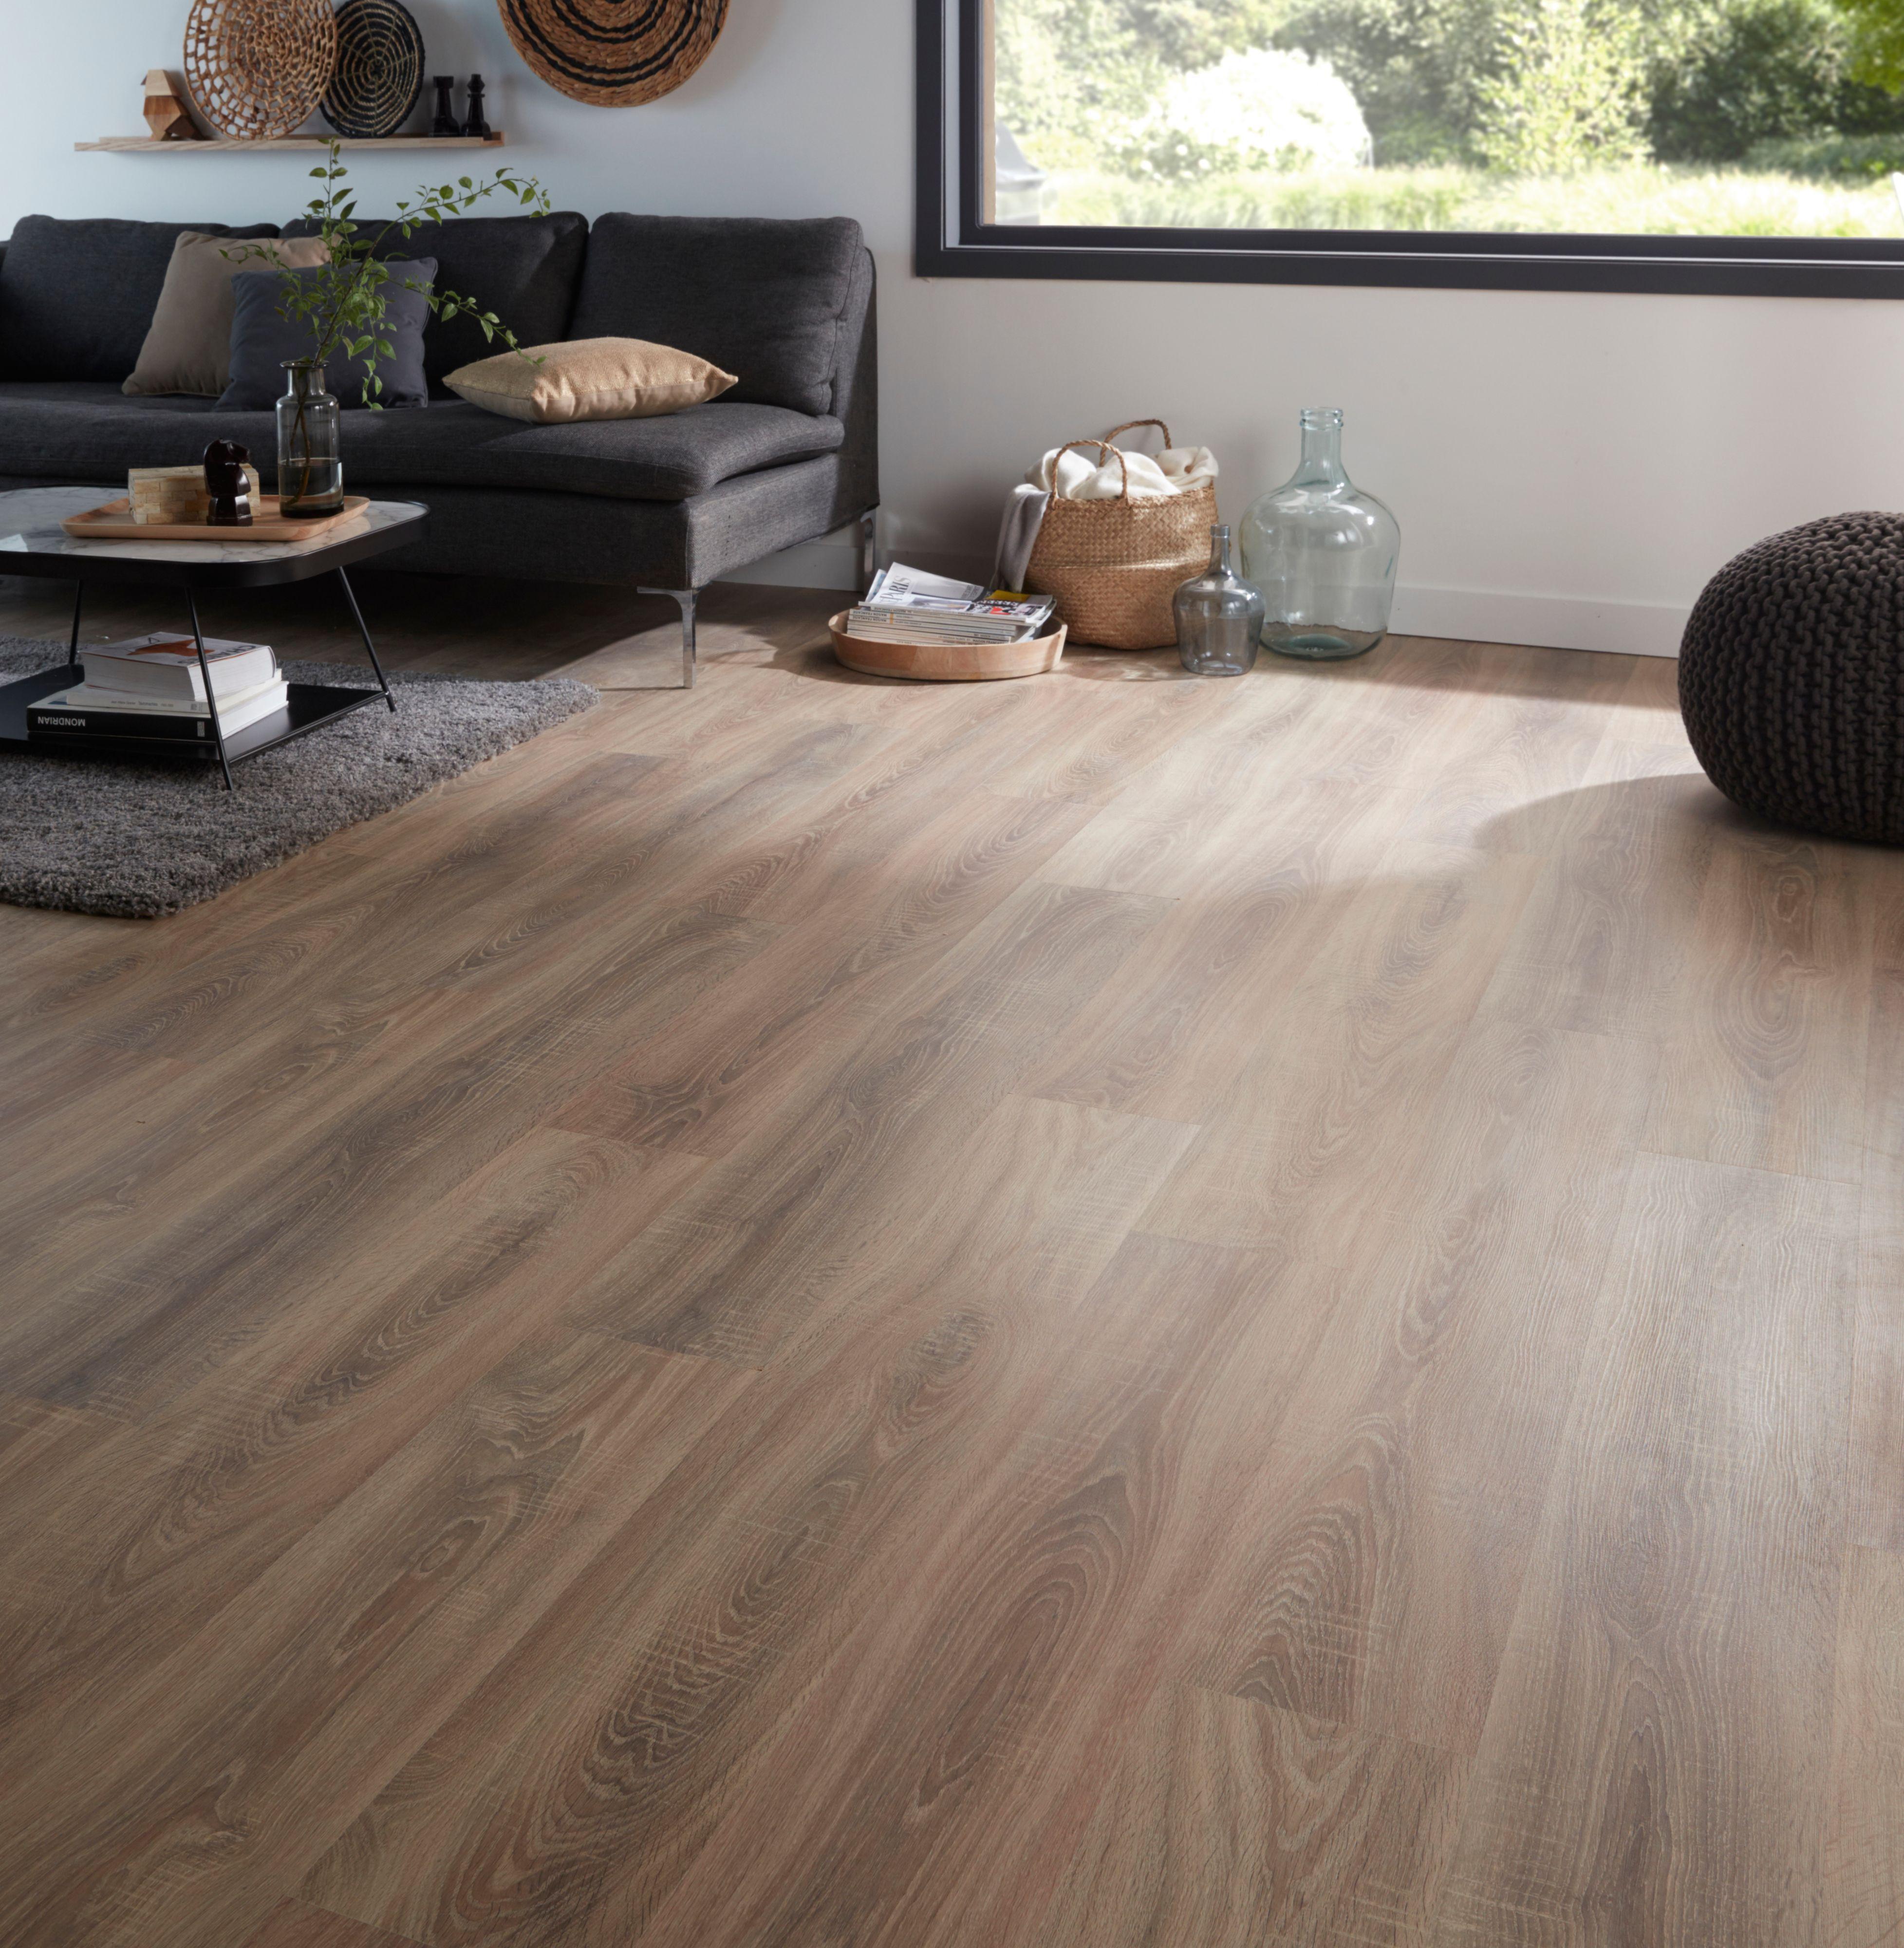 Natural Oak Effect Laminate Flooring Part - 36: Albury Natural Oak Effect Laminate Flooring Sample